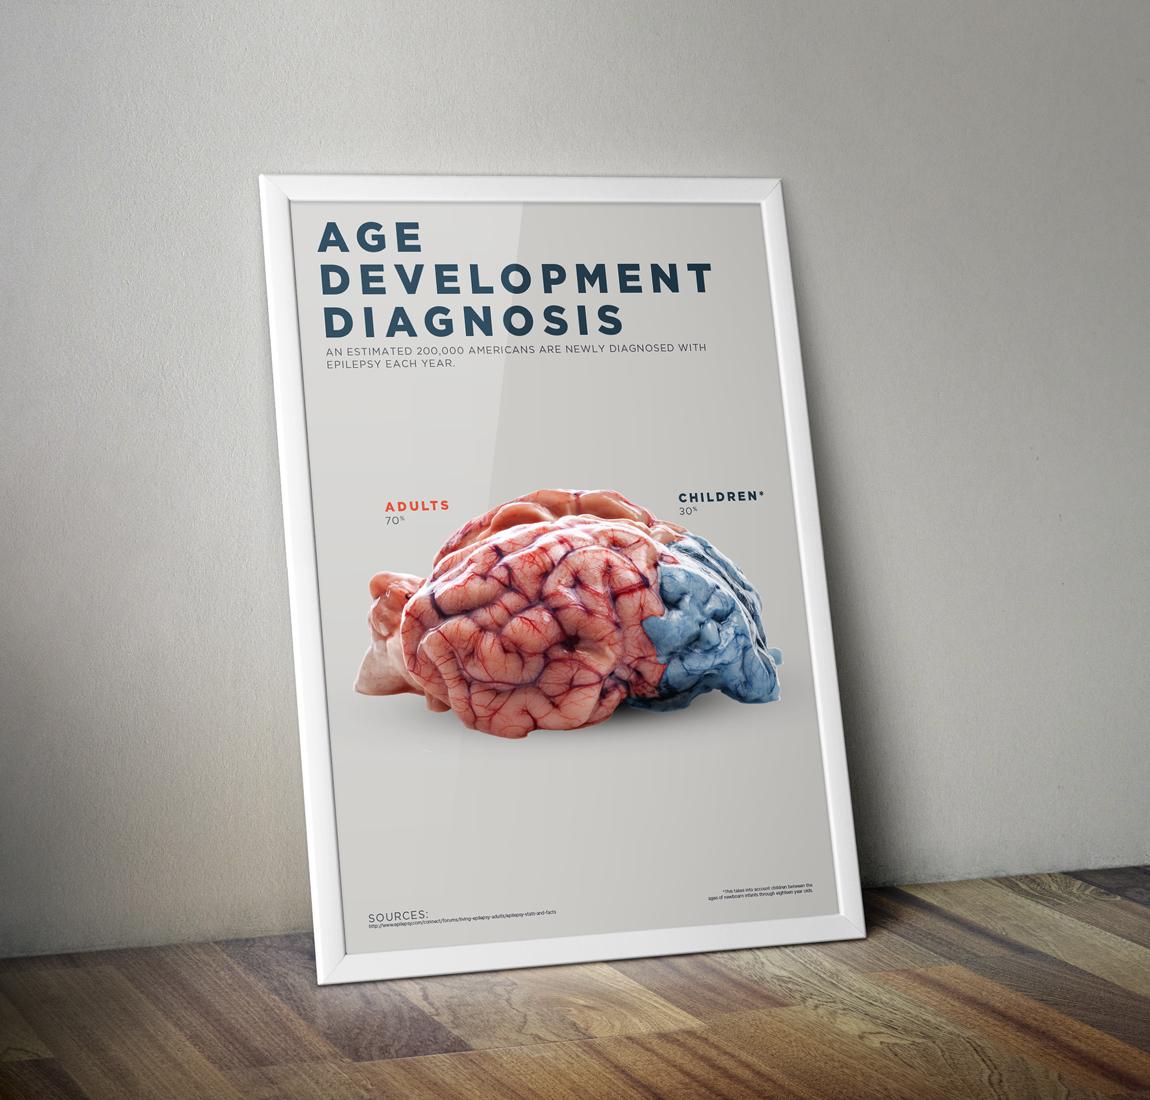 Age Development Diagnosis